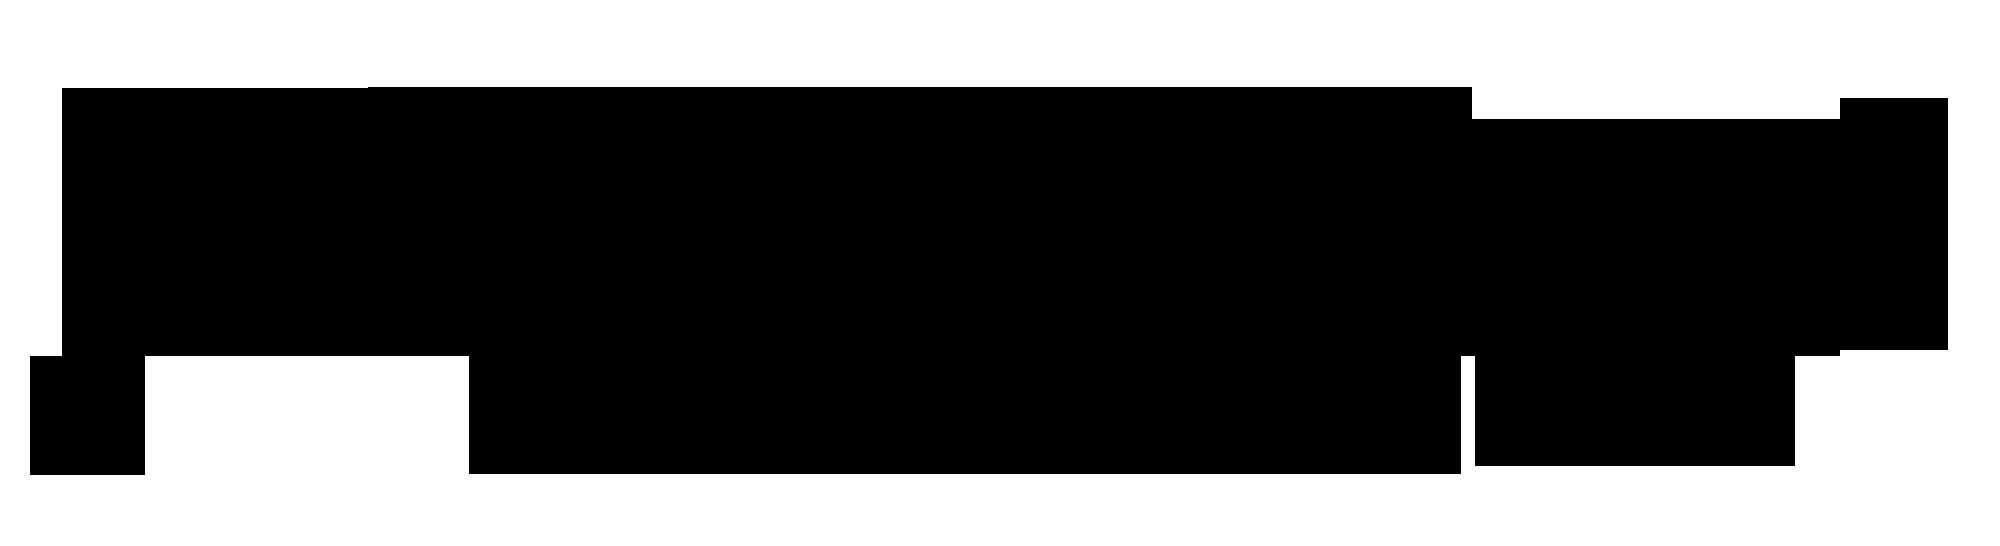 Fox_Logo_2.png